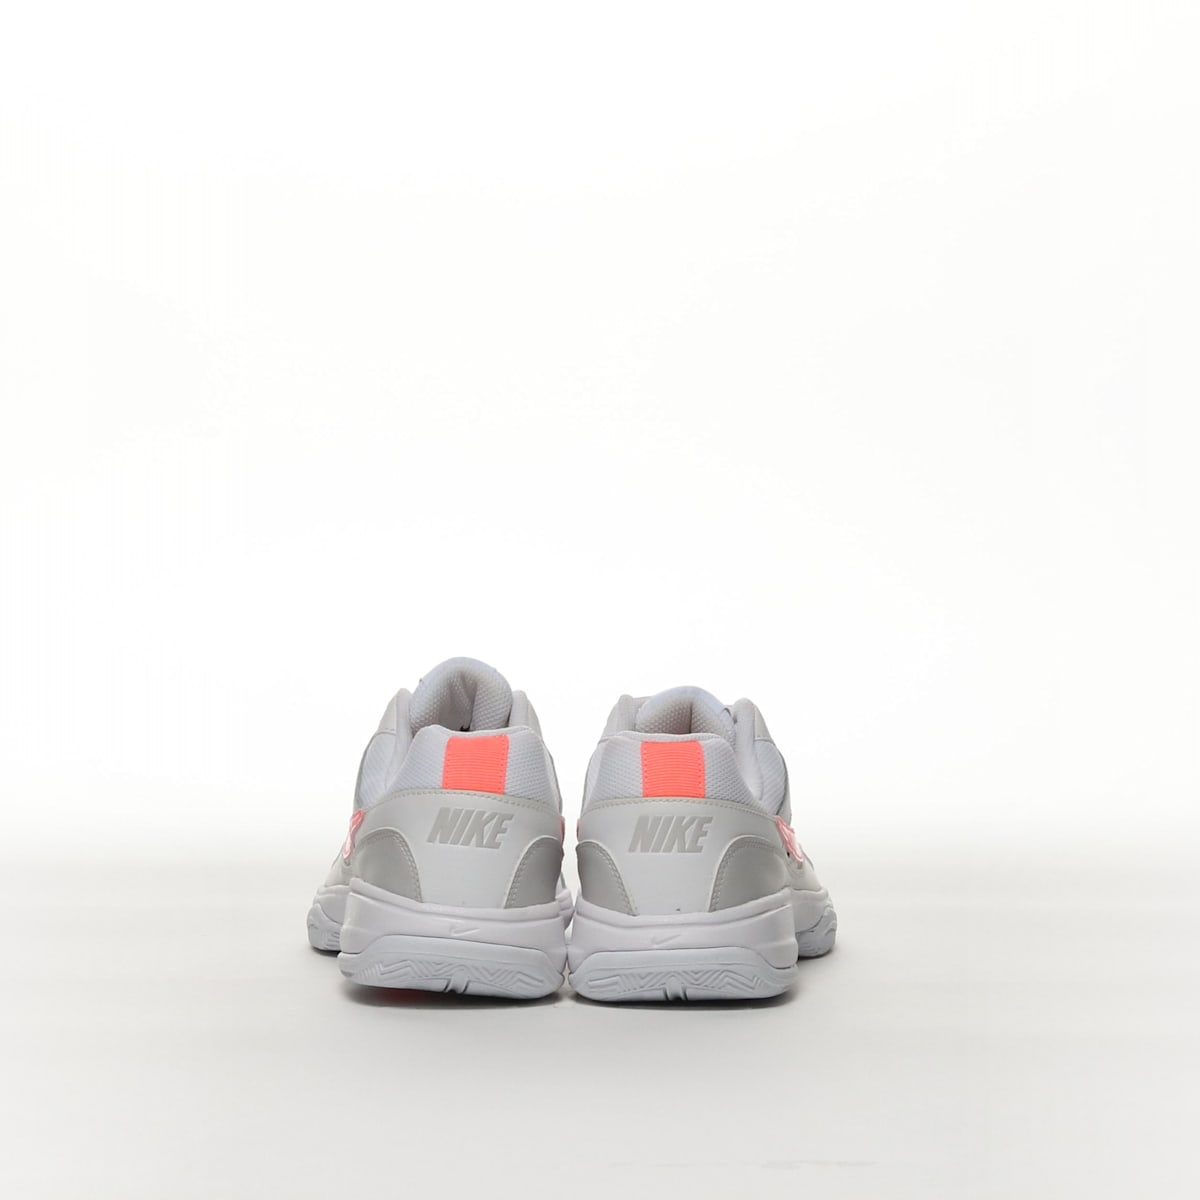 dfae072ef57 Women s Nike Court Lite Tennis Shoe - WHITE LAVA GLOW-VAST GREY – Resku